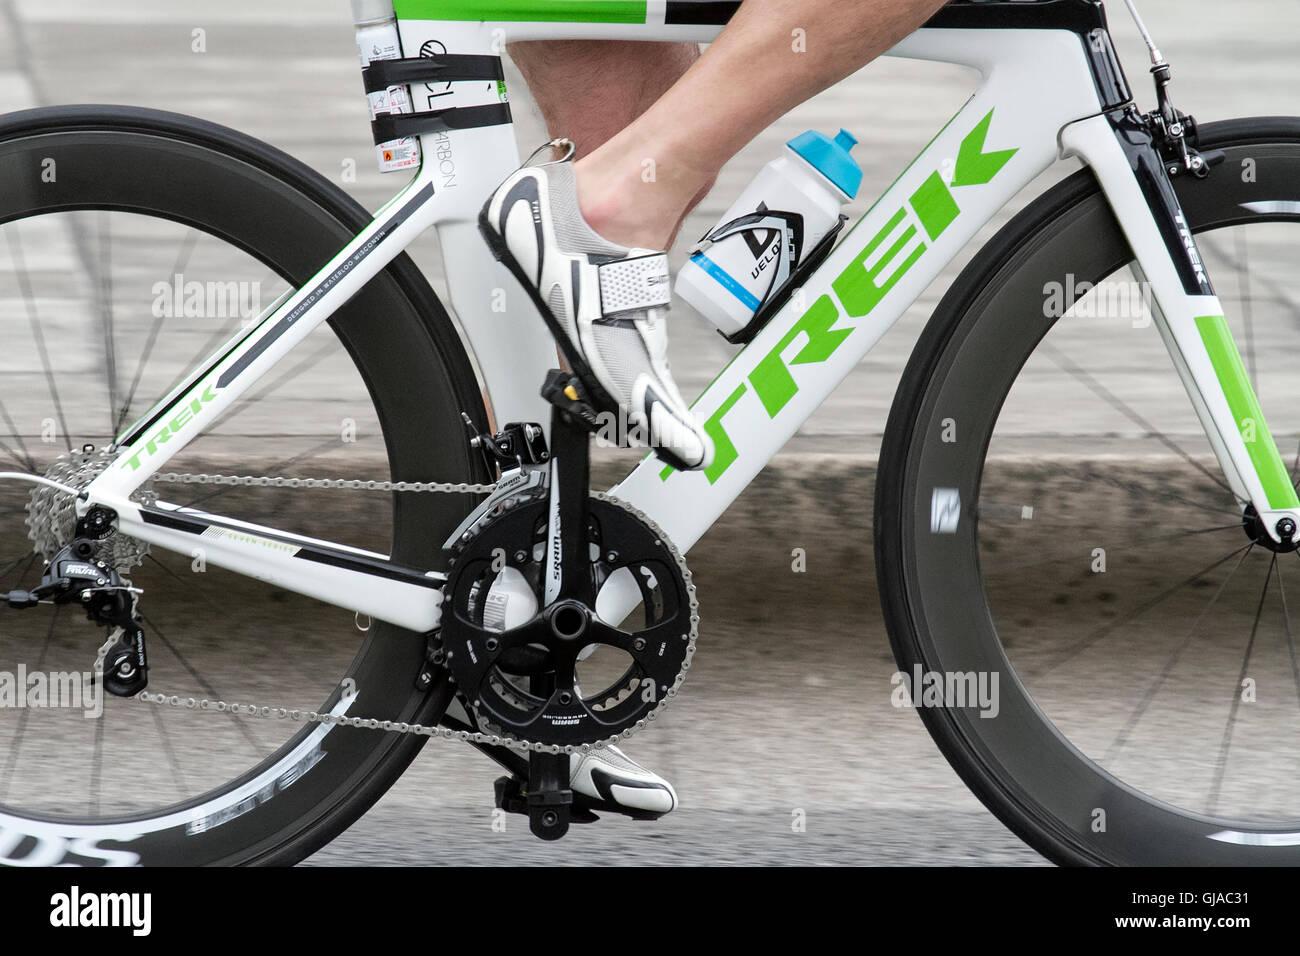 Una Fibra De Carbono Ligera Bicicleta De Carreras Carrera Ciclista Ciclismo Cannondale Boardman Especializados Trek 105 870 Solan Pinarello Bianchi Planeta X Ribble Bicicletas Fotografía De Stock Alamy